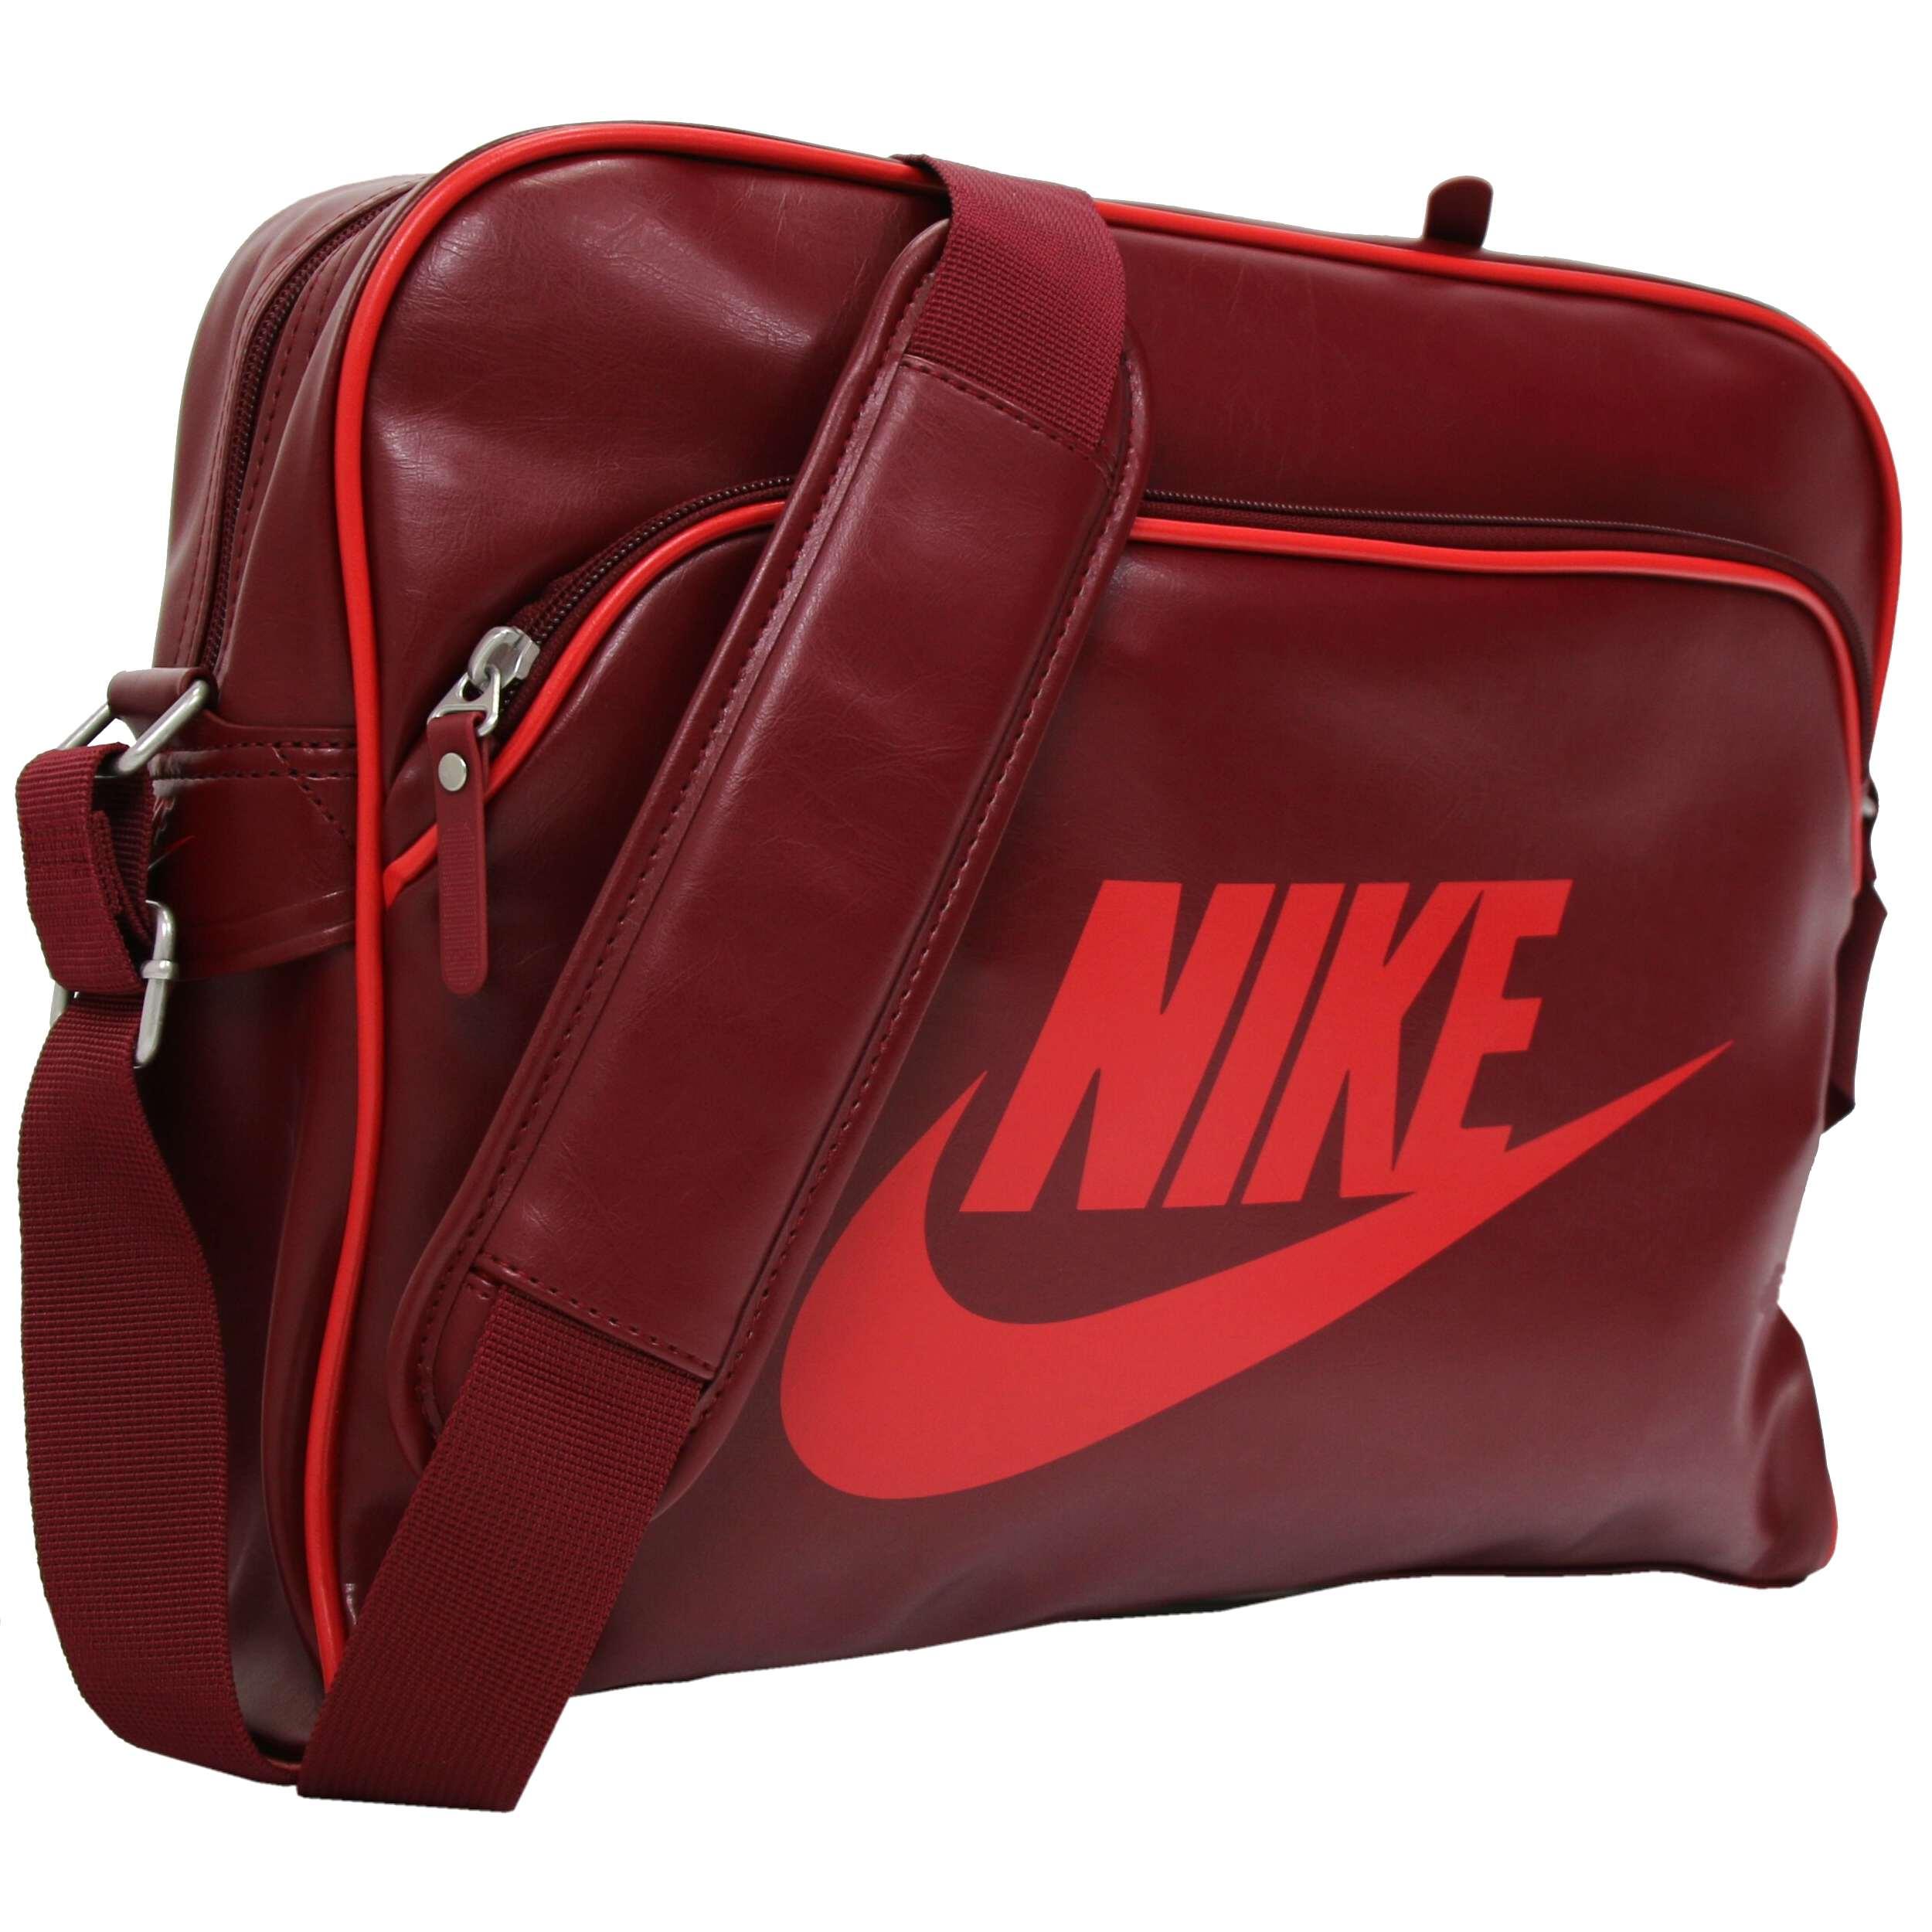 Nike Heritage Si Club Sac à Bandoulière : Nike heritage si track sac ? bandouli?re a bandouliere